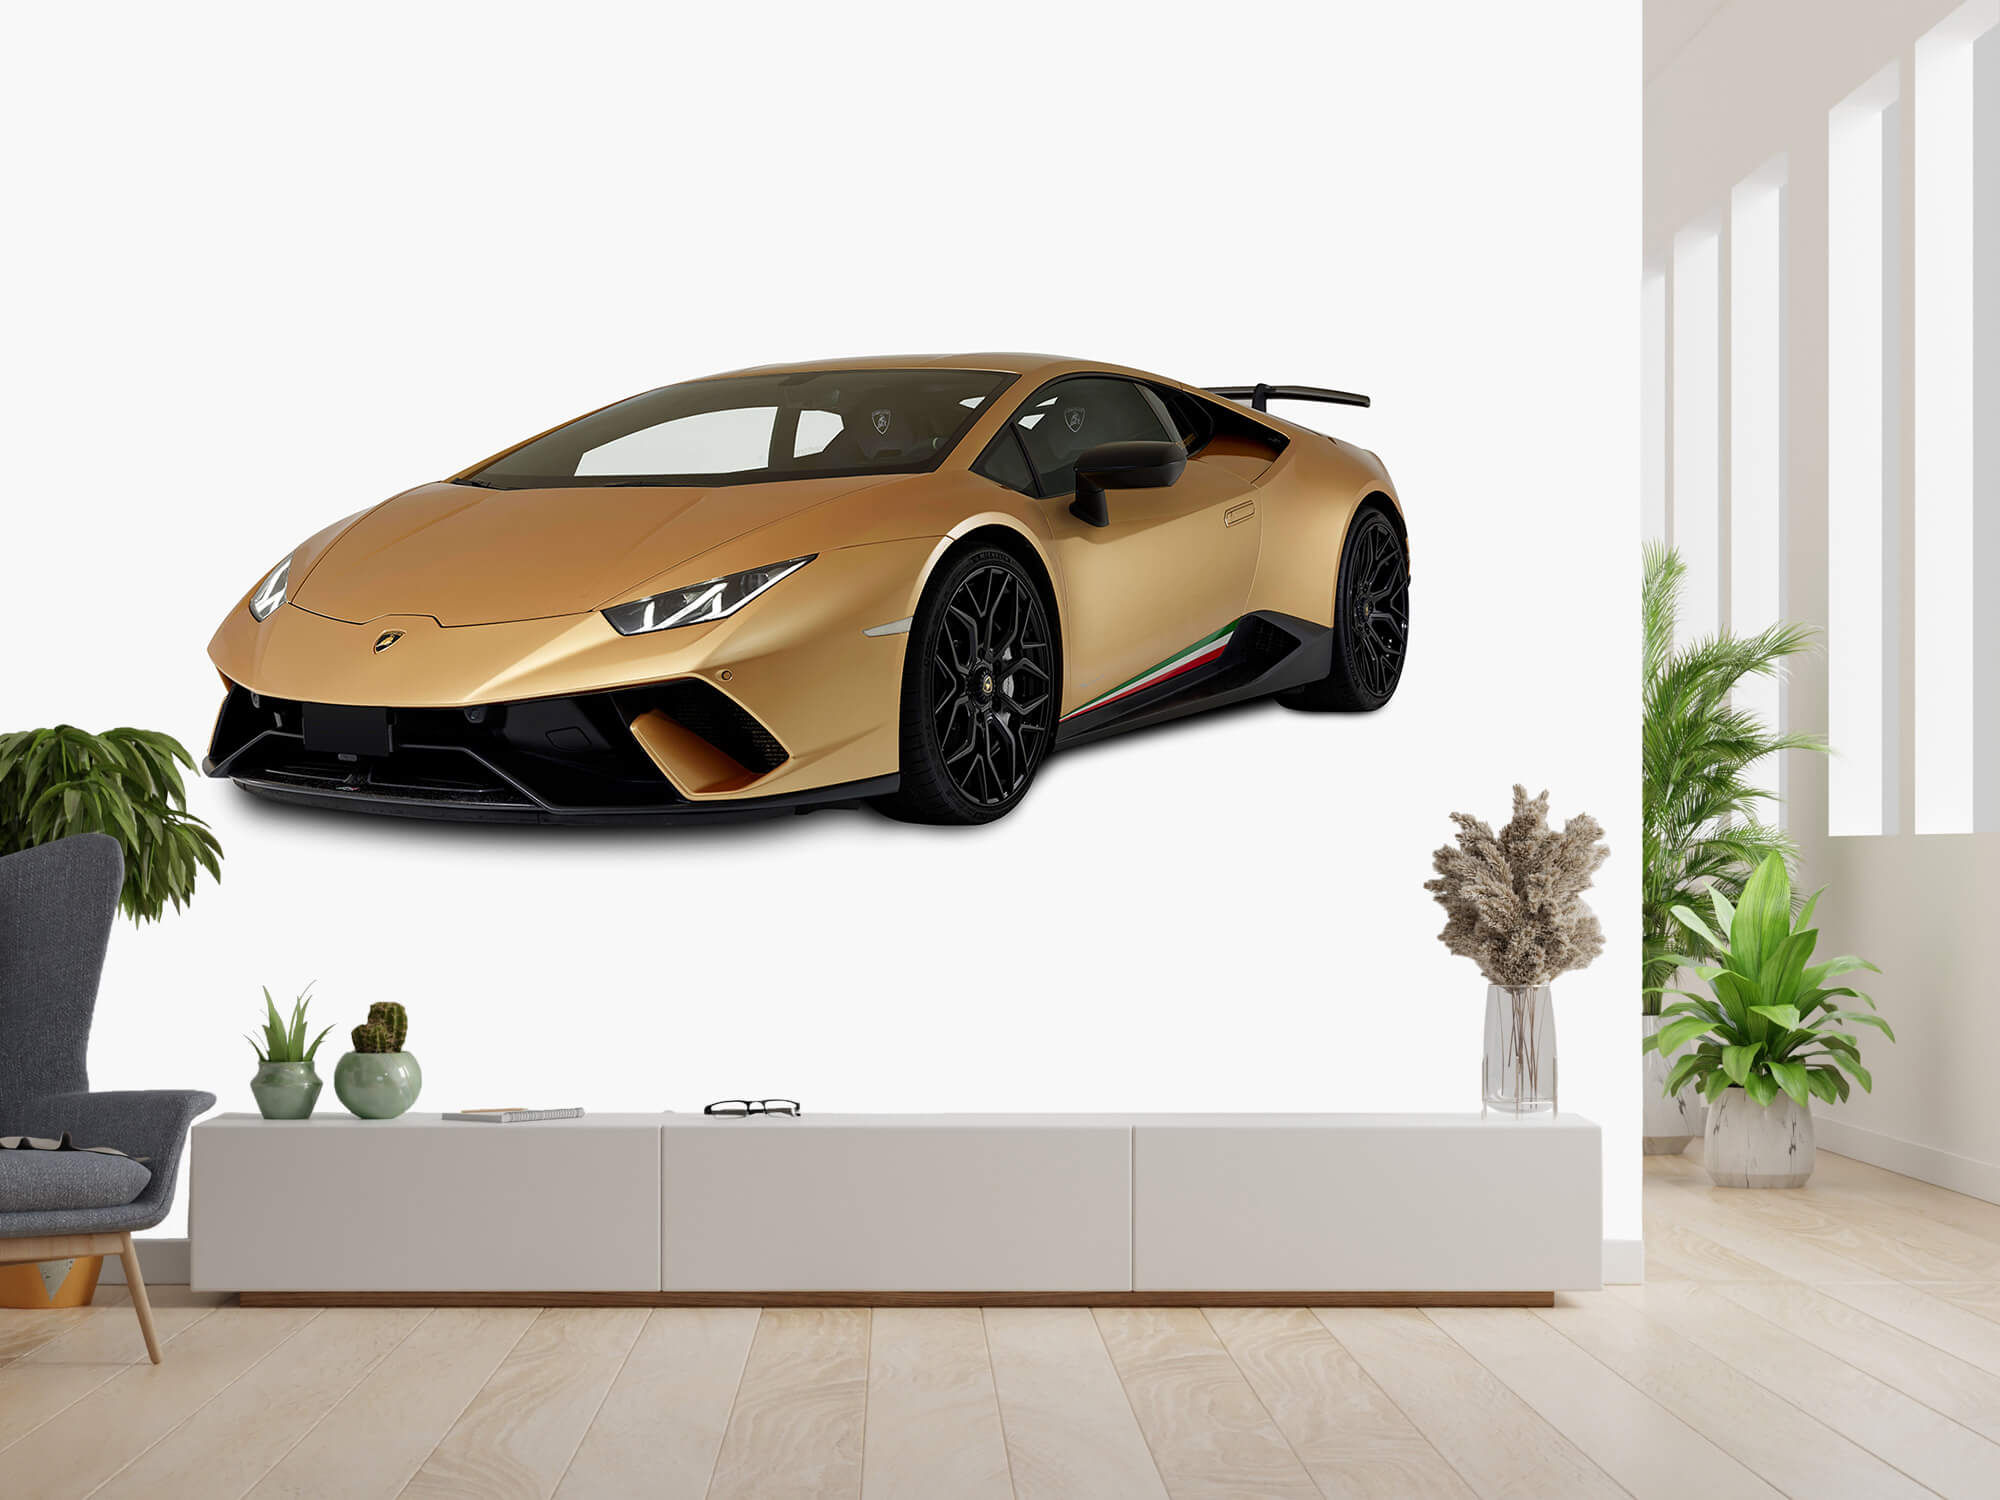 Wallpaper Lamborghini Huracán - Avant droit, blanc 14